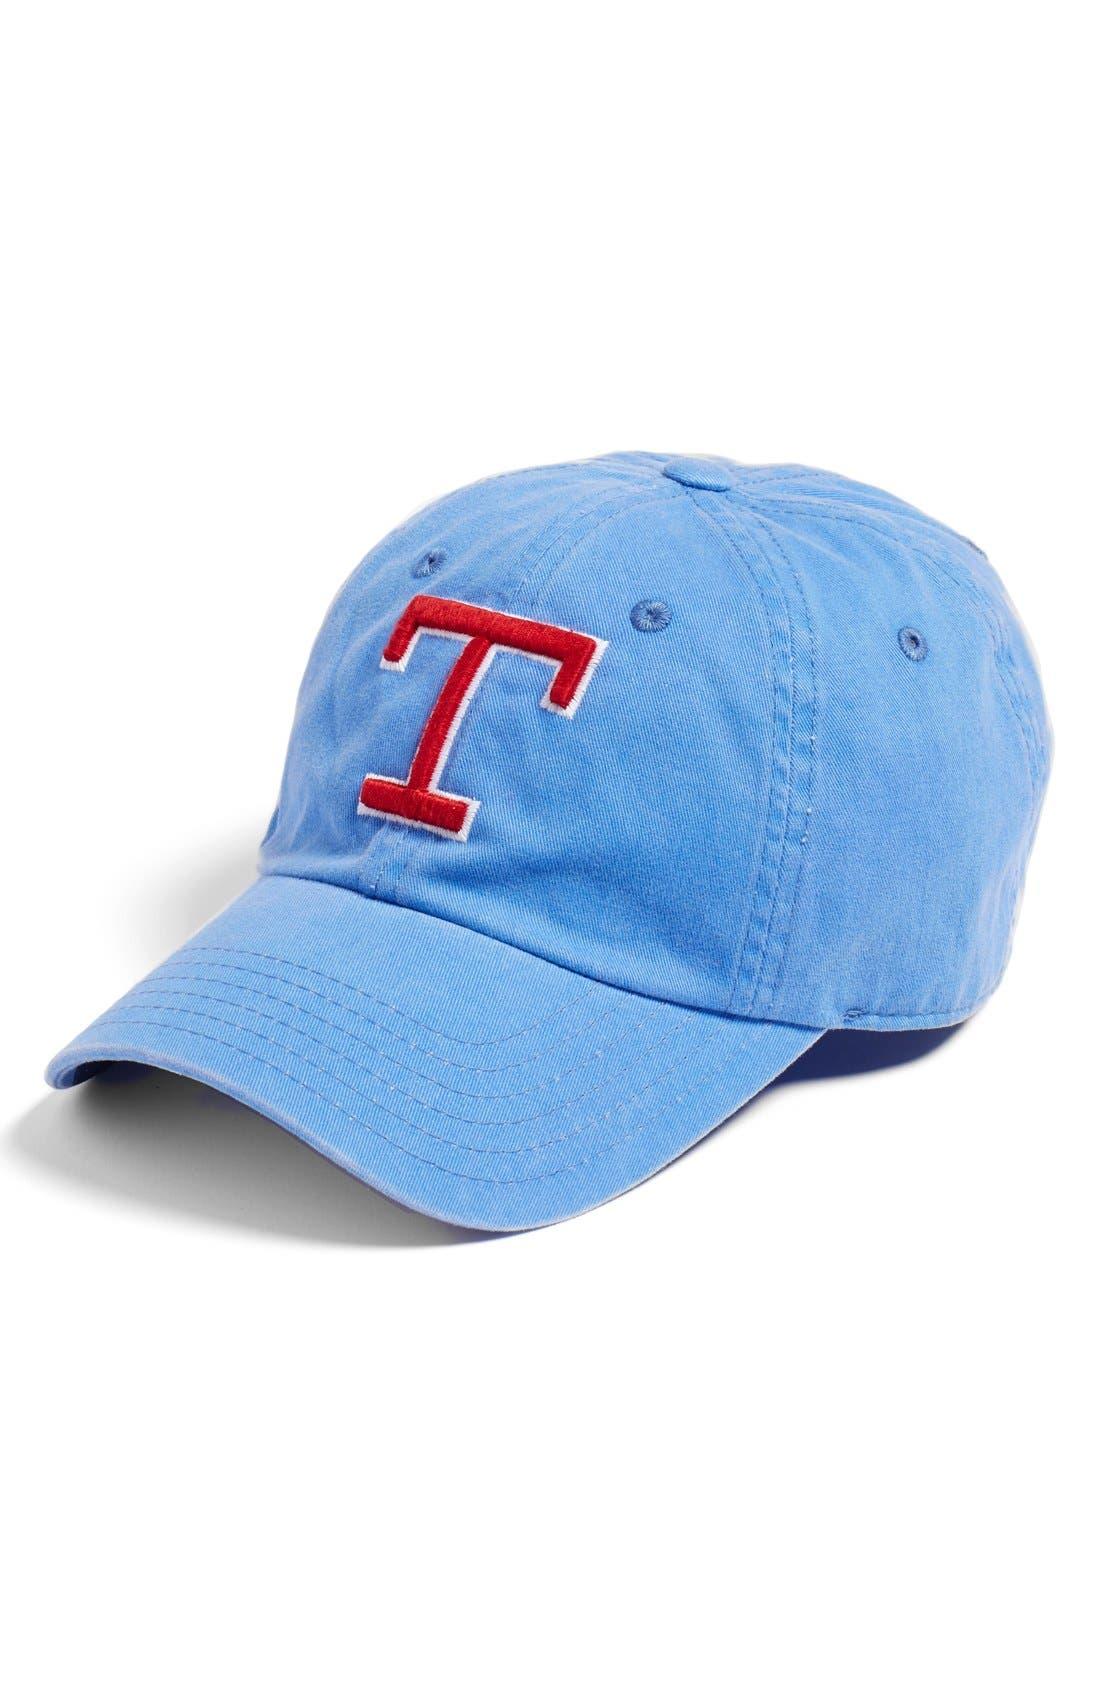 AMERICAN NEEDLE New Raglan Texas Rangers Baseball Cap